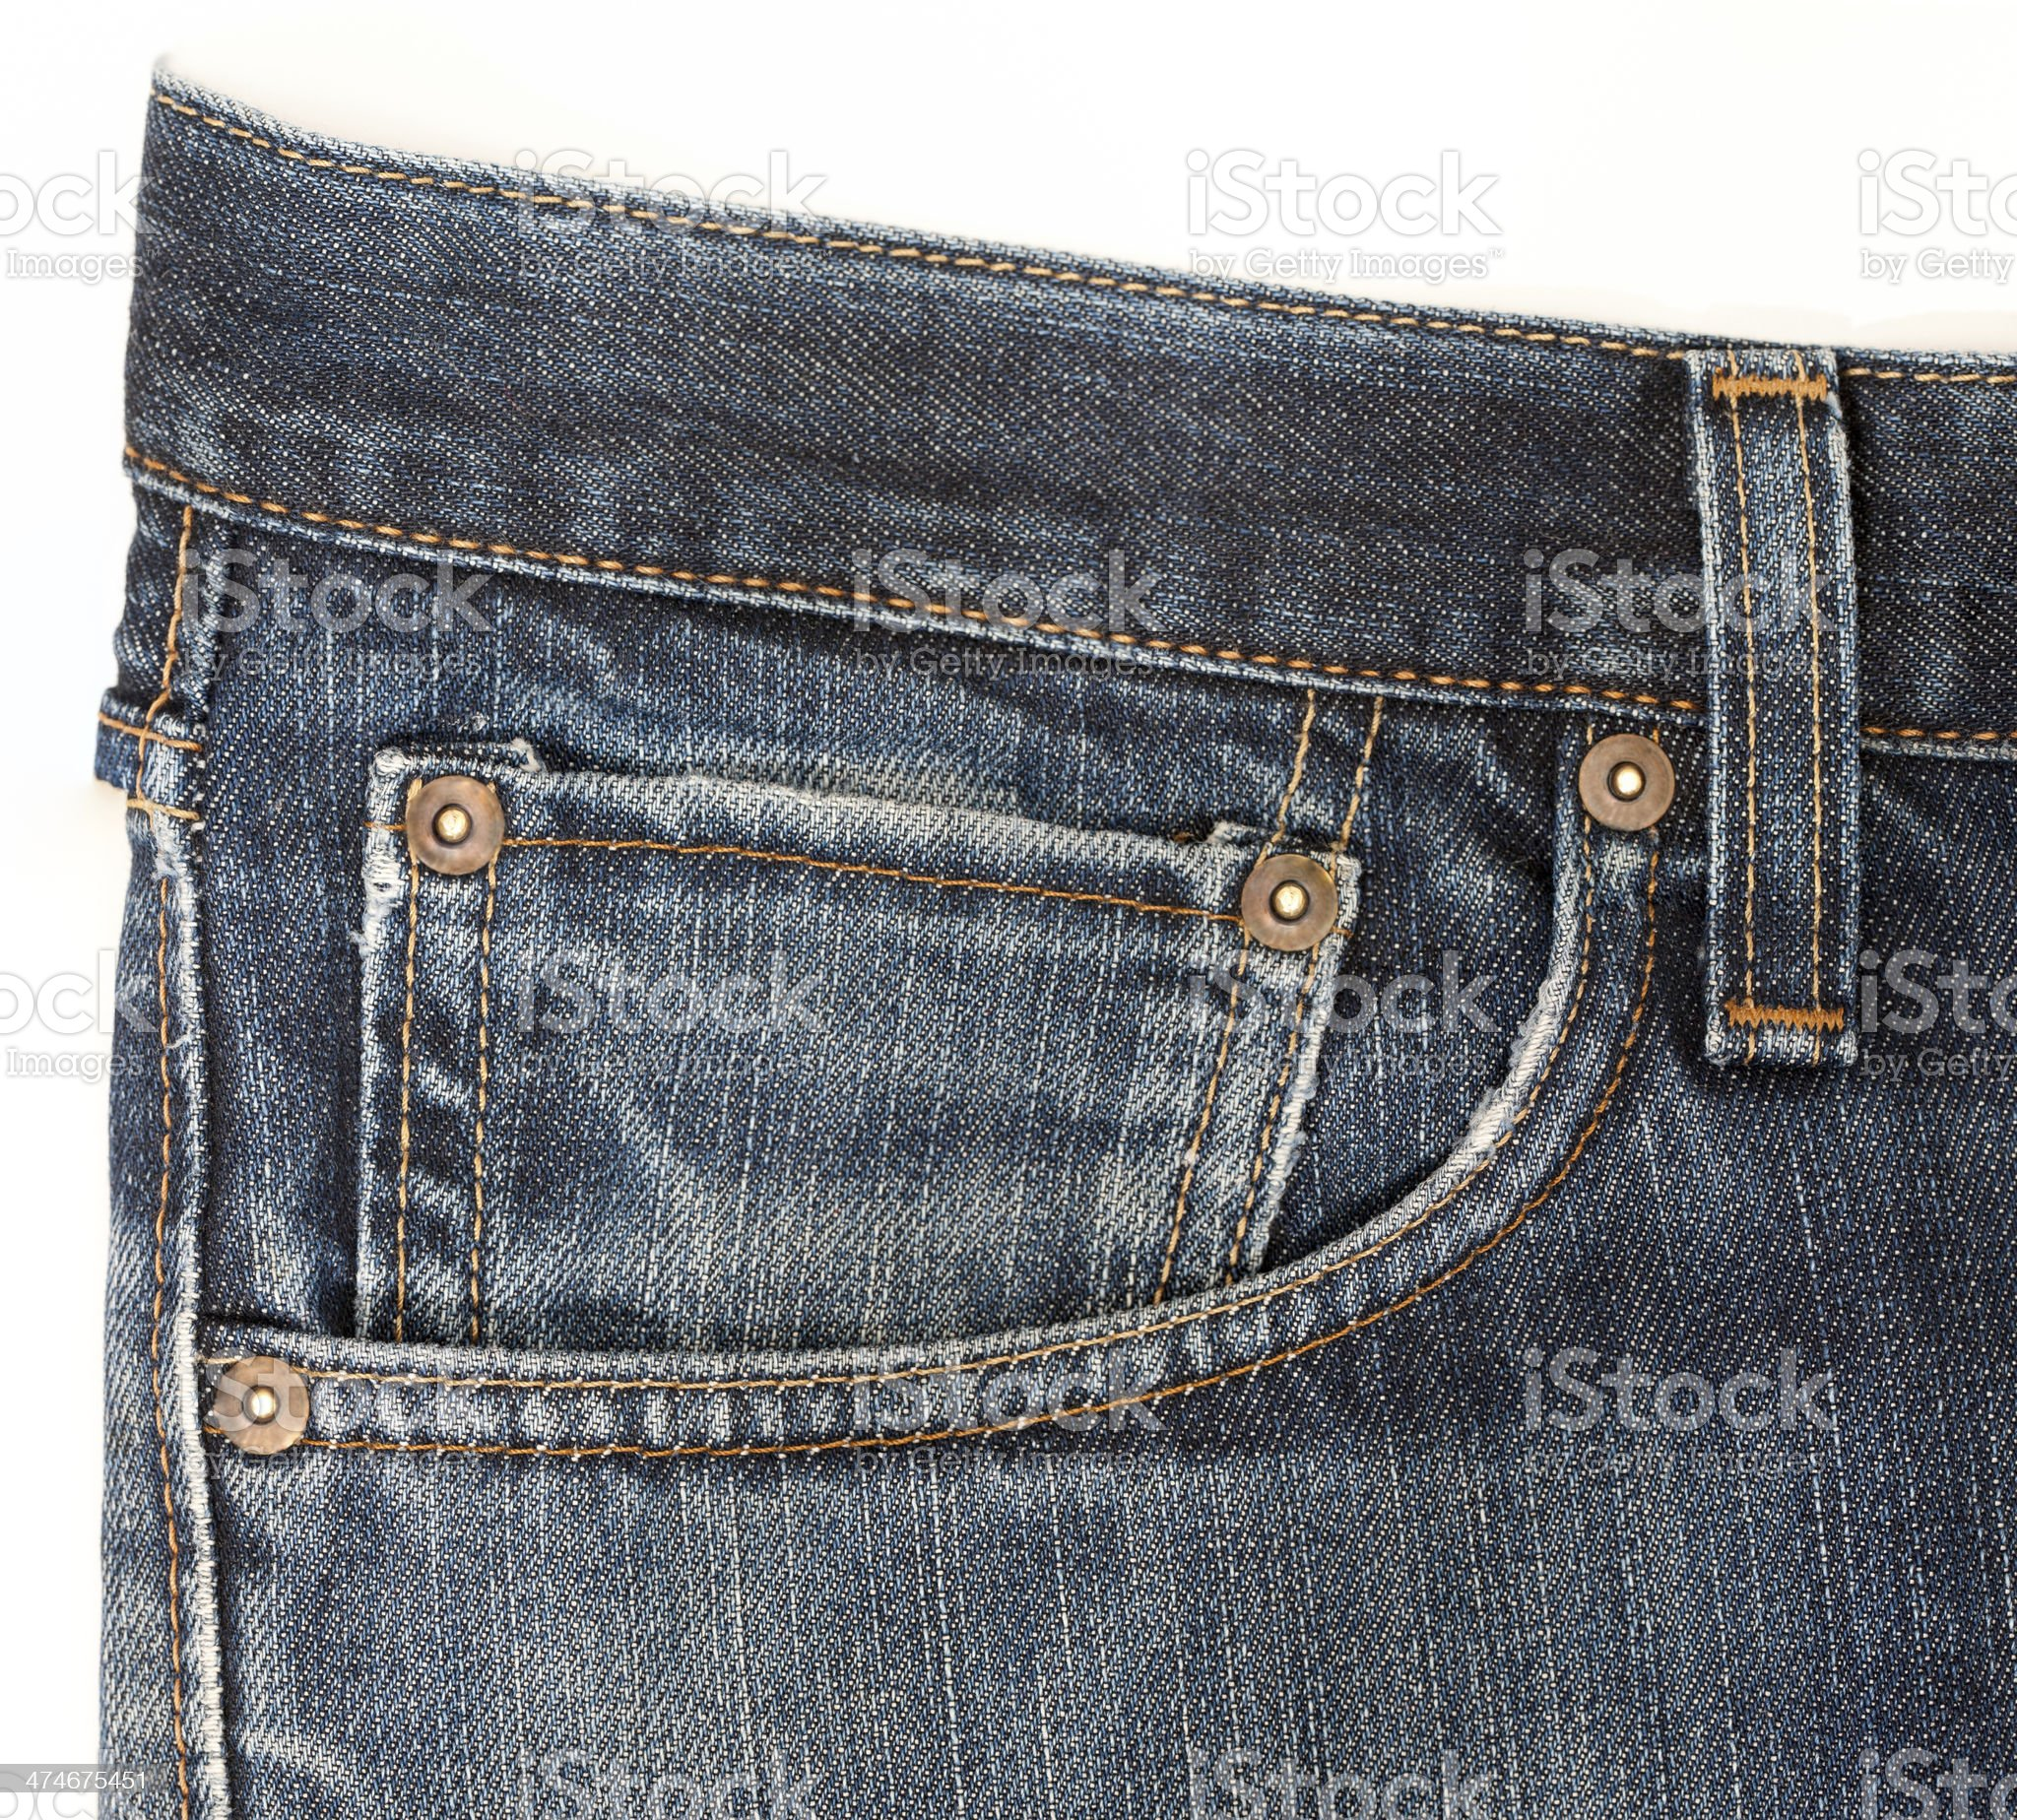 Jeans pocket royalty-free stock photo